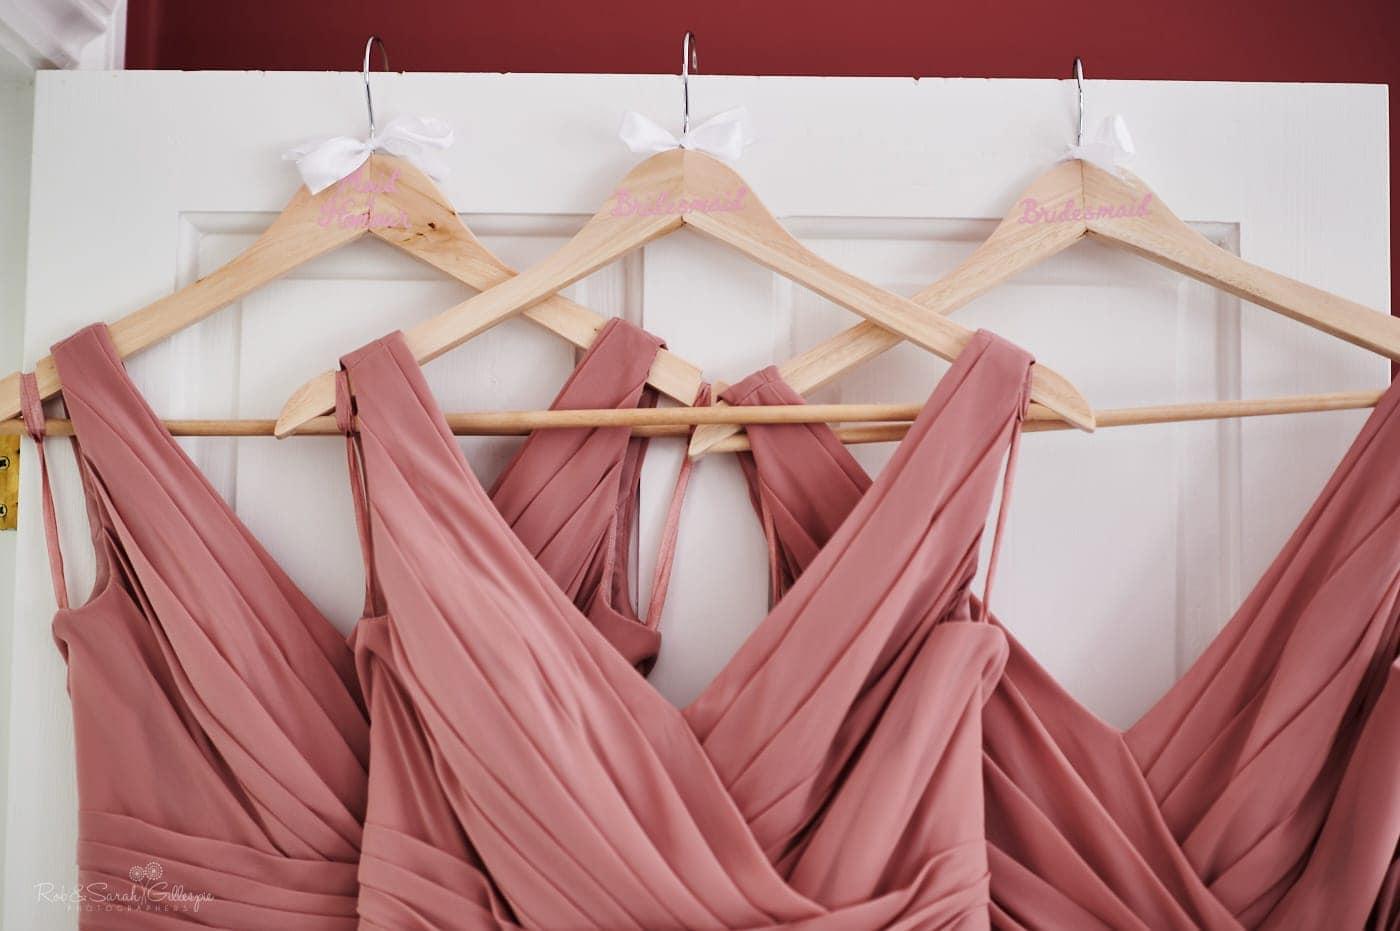 Pink bridesmaids dresses on hangers